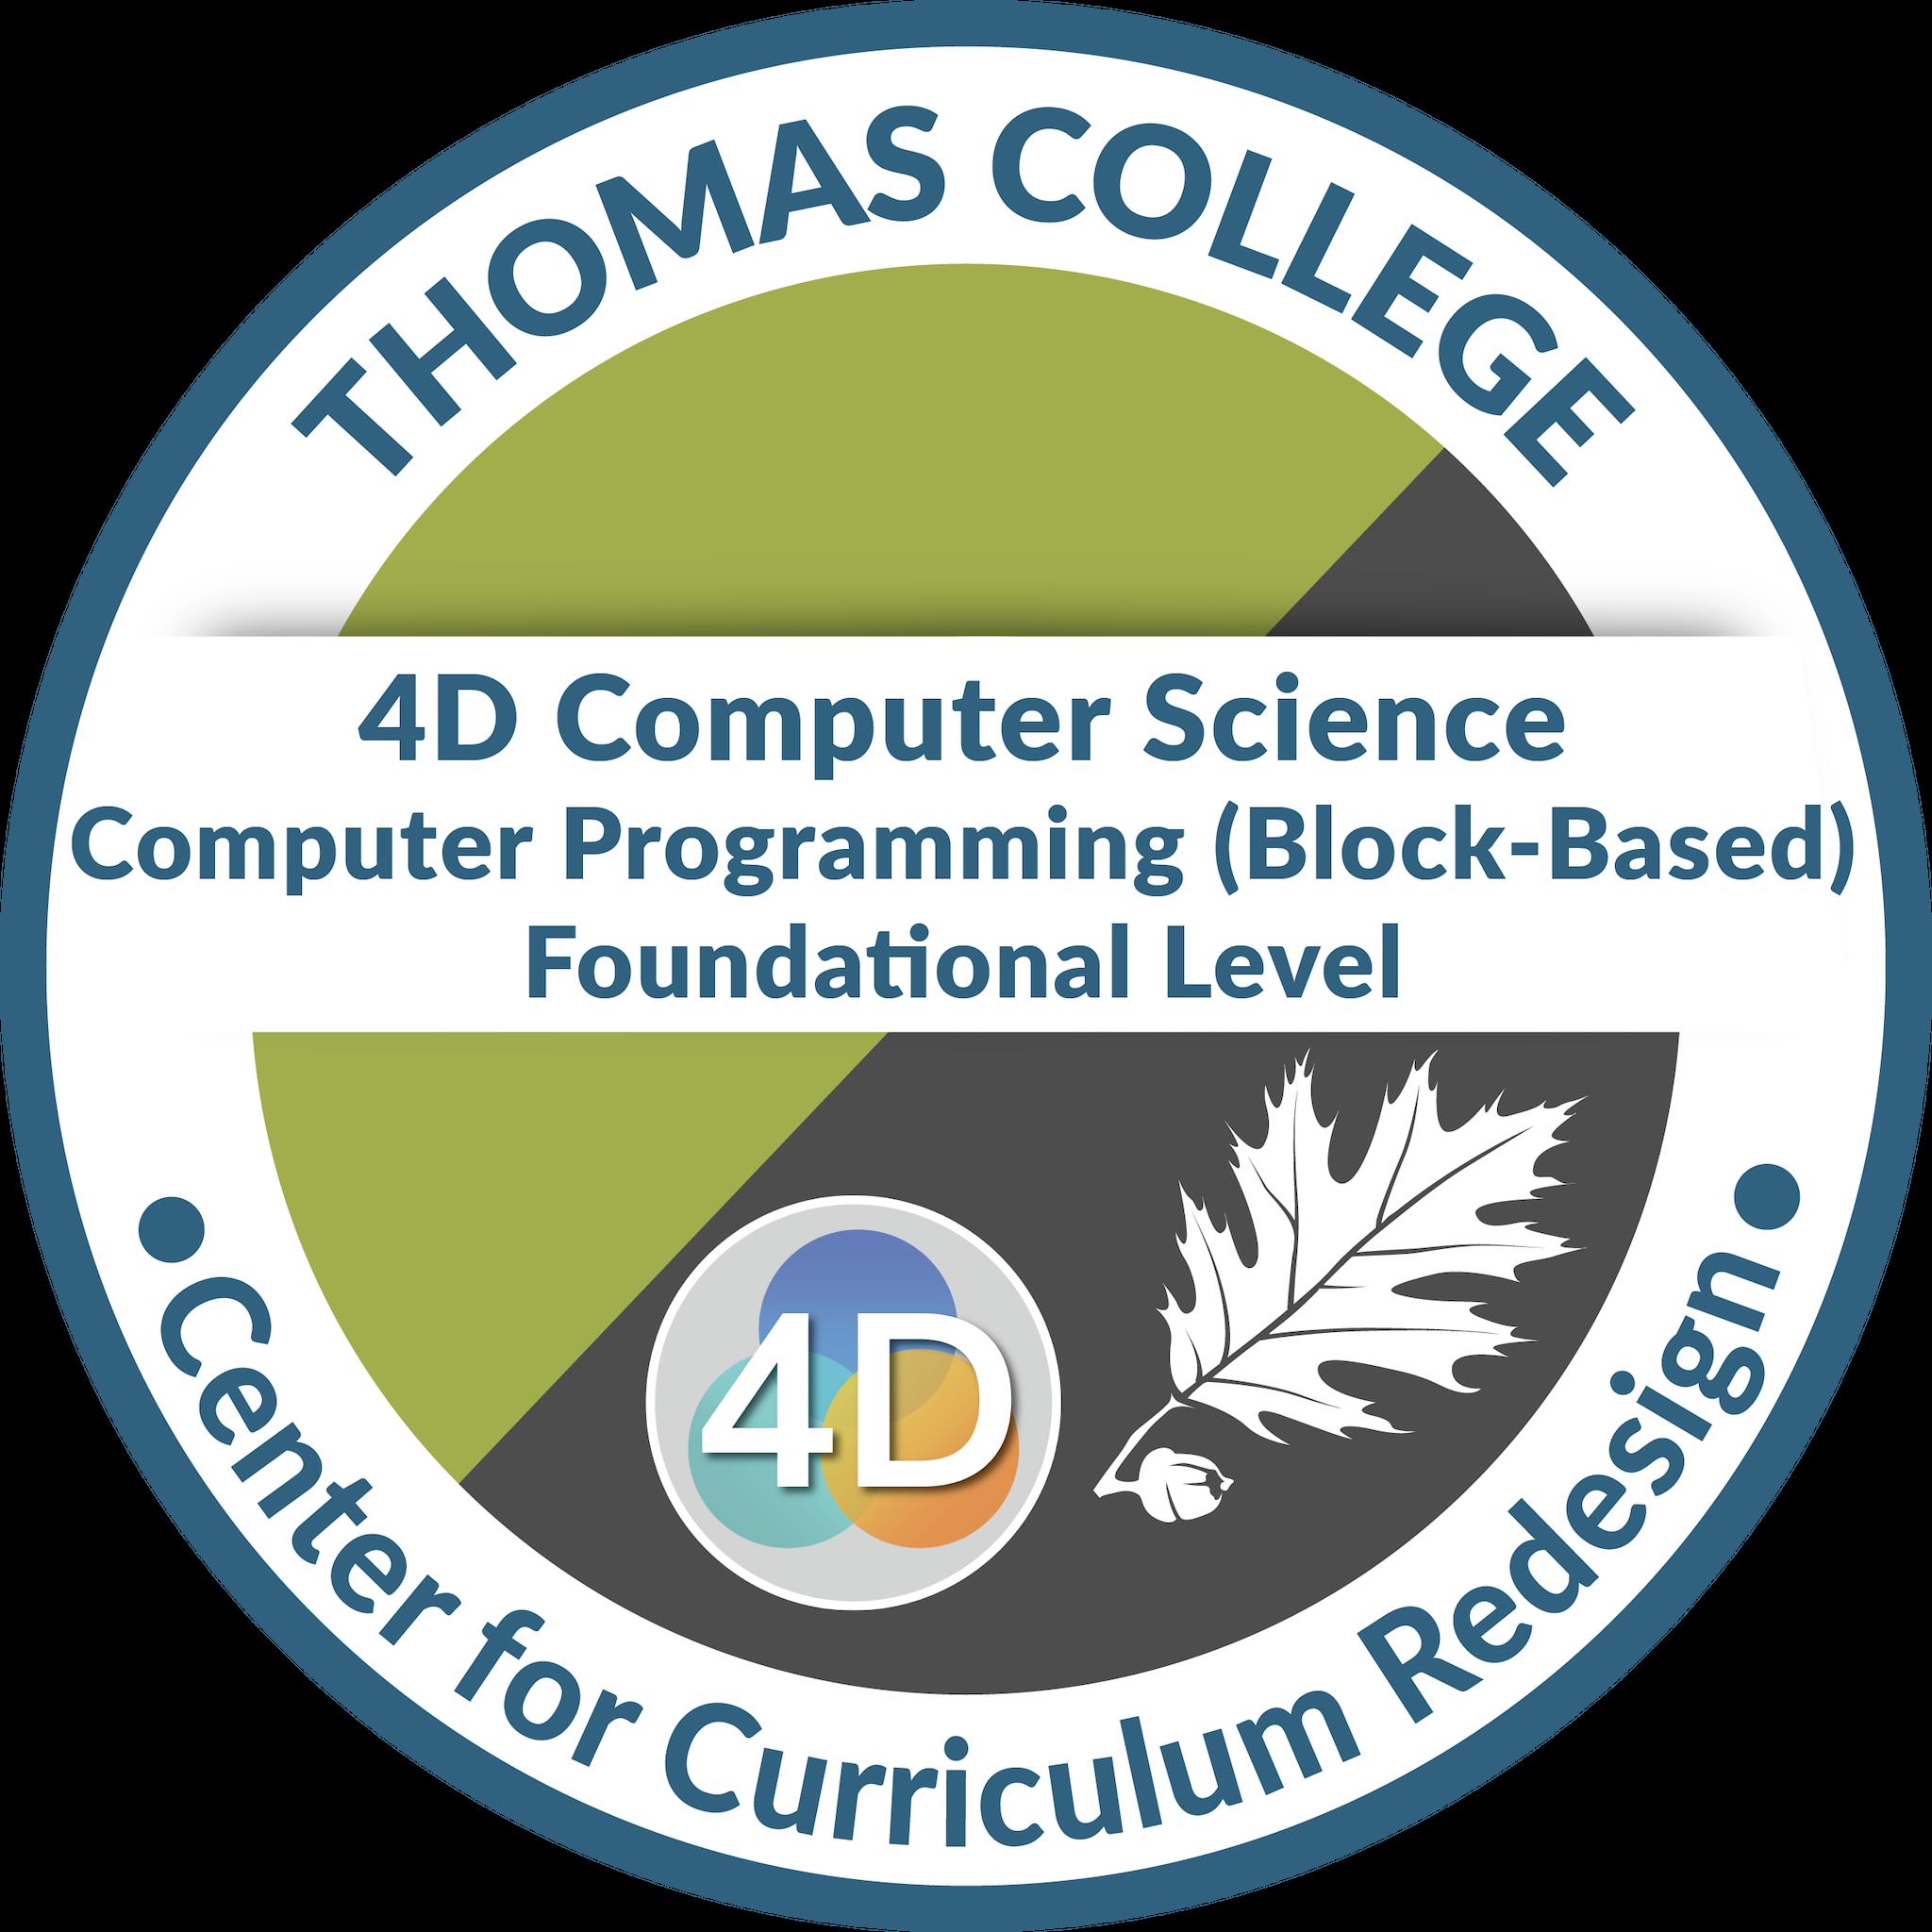 4D Computer Science: Computer Programming (Block-Based)